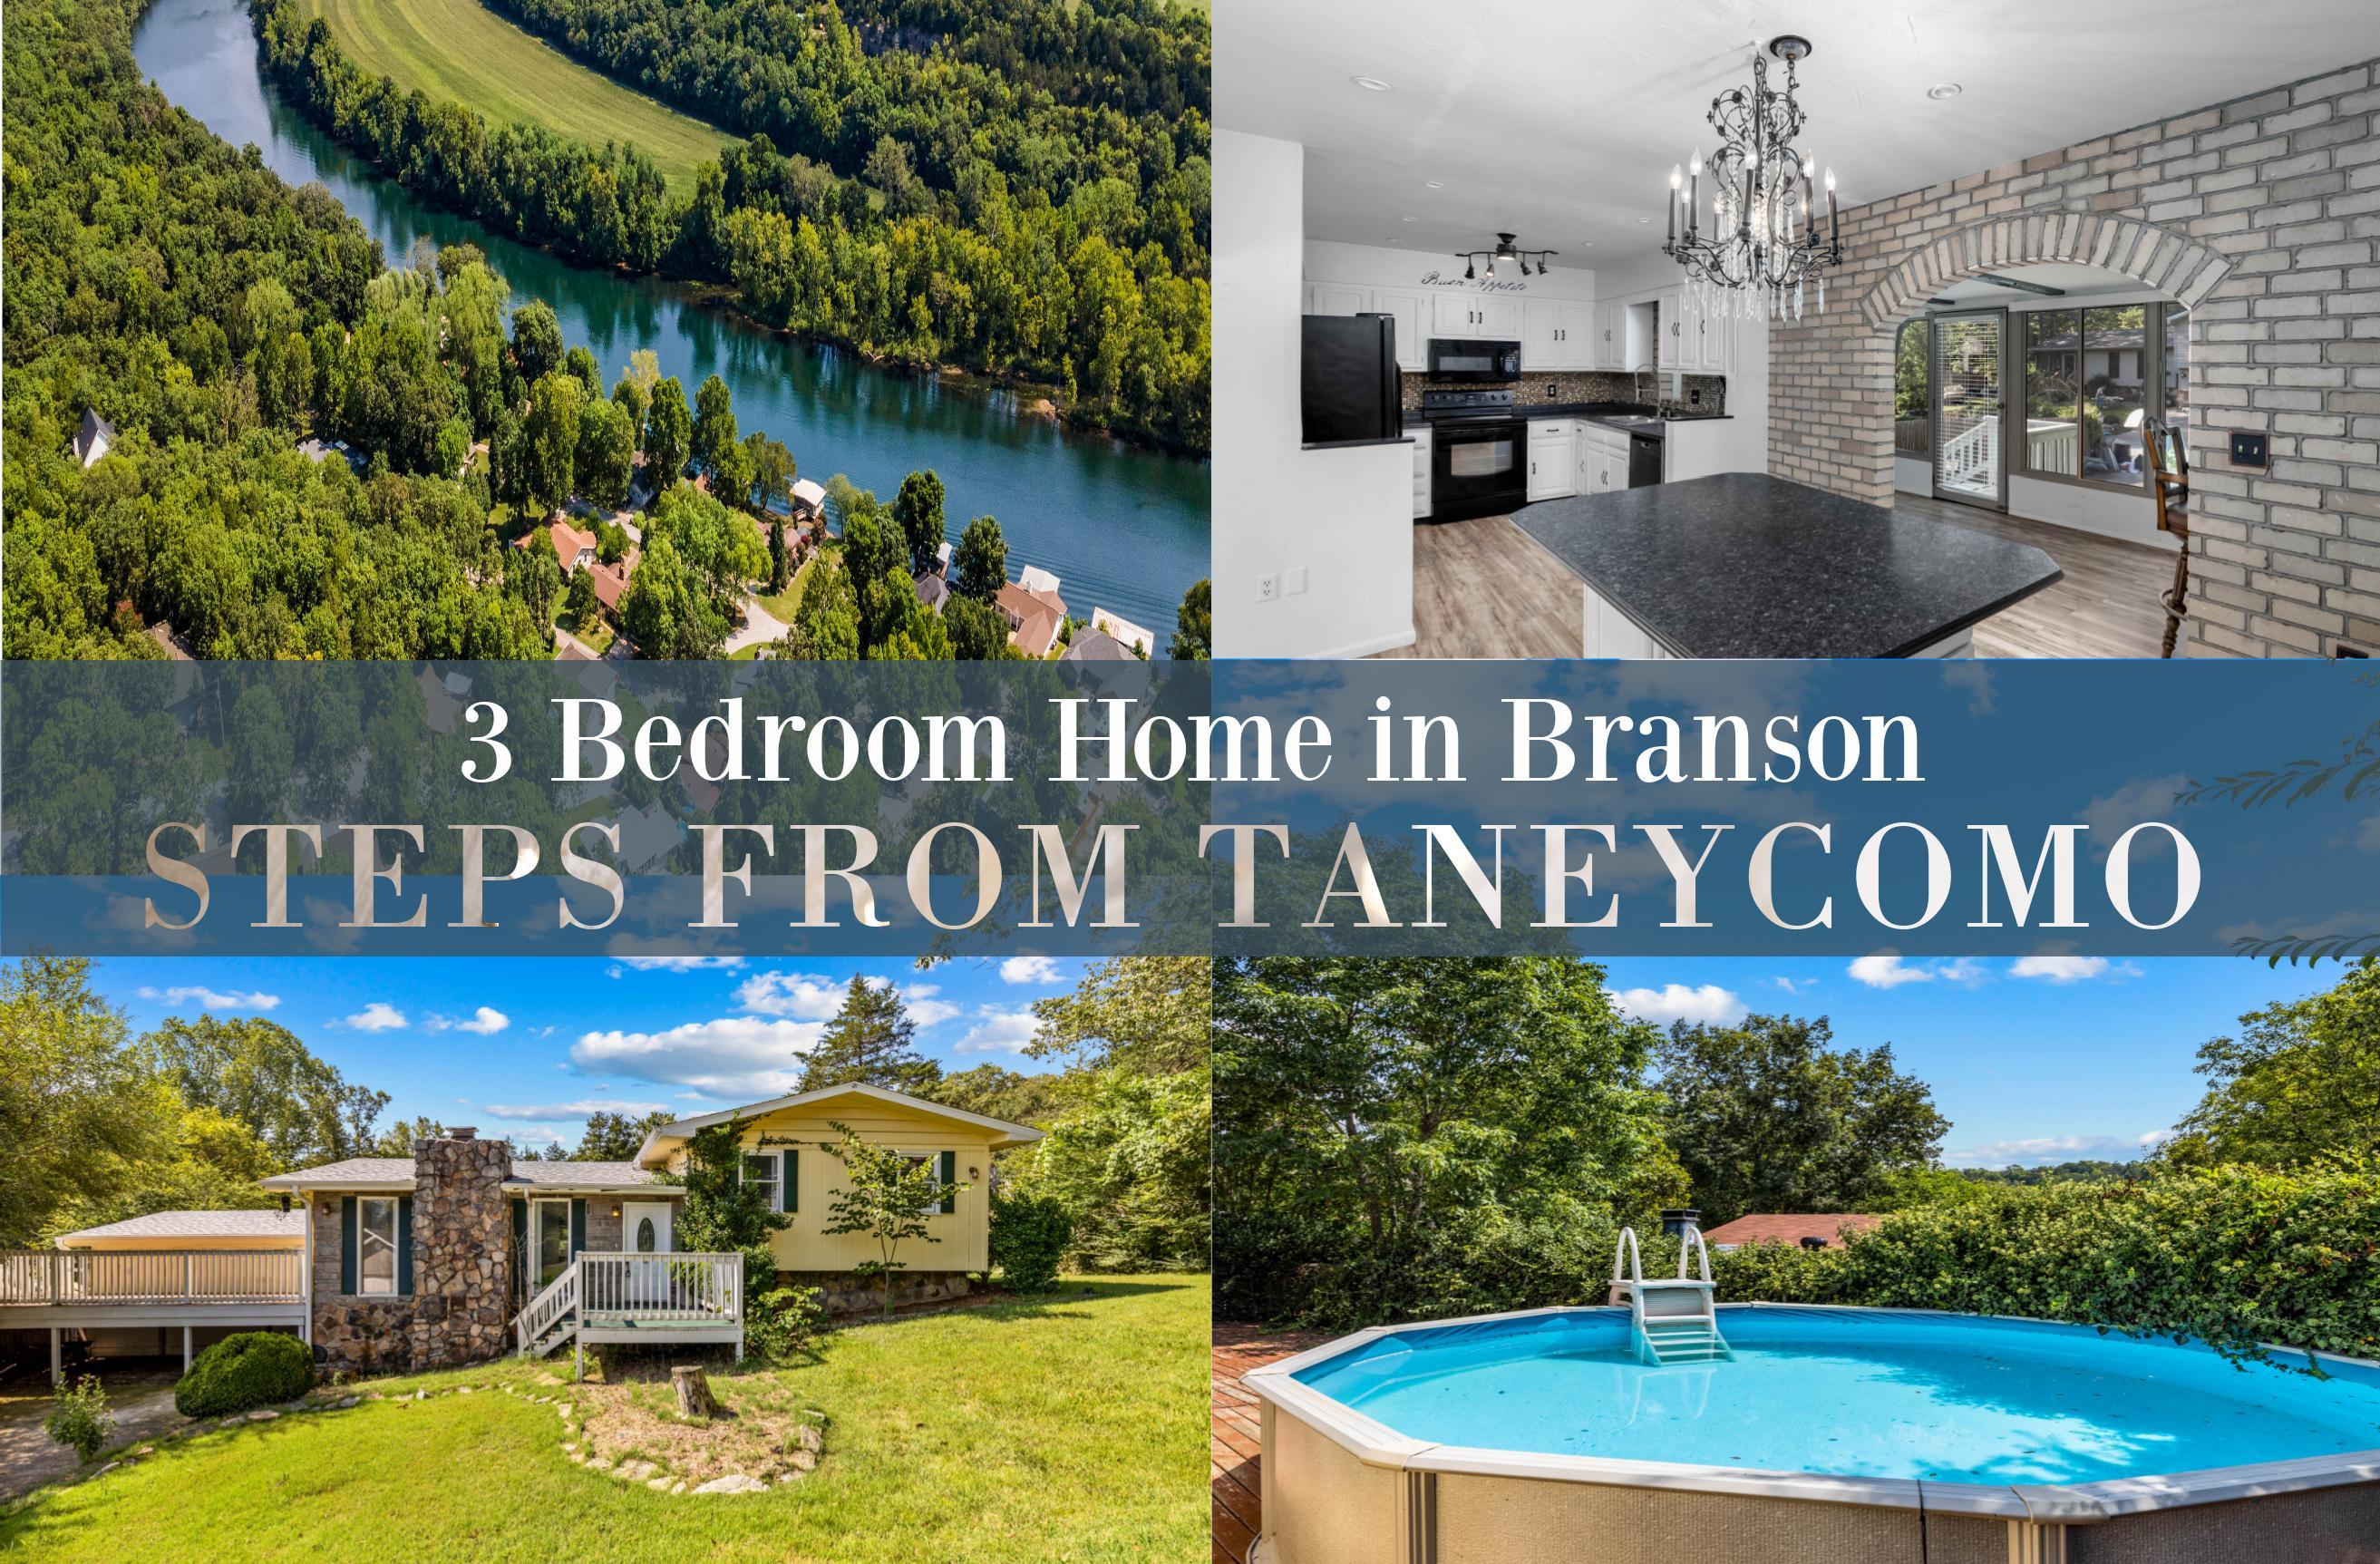 329 Dandy Way Branson, MO 65616